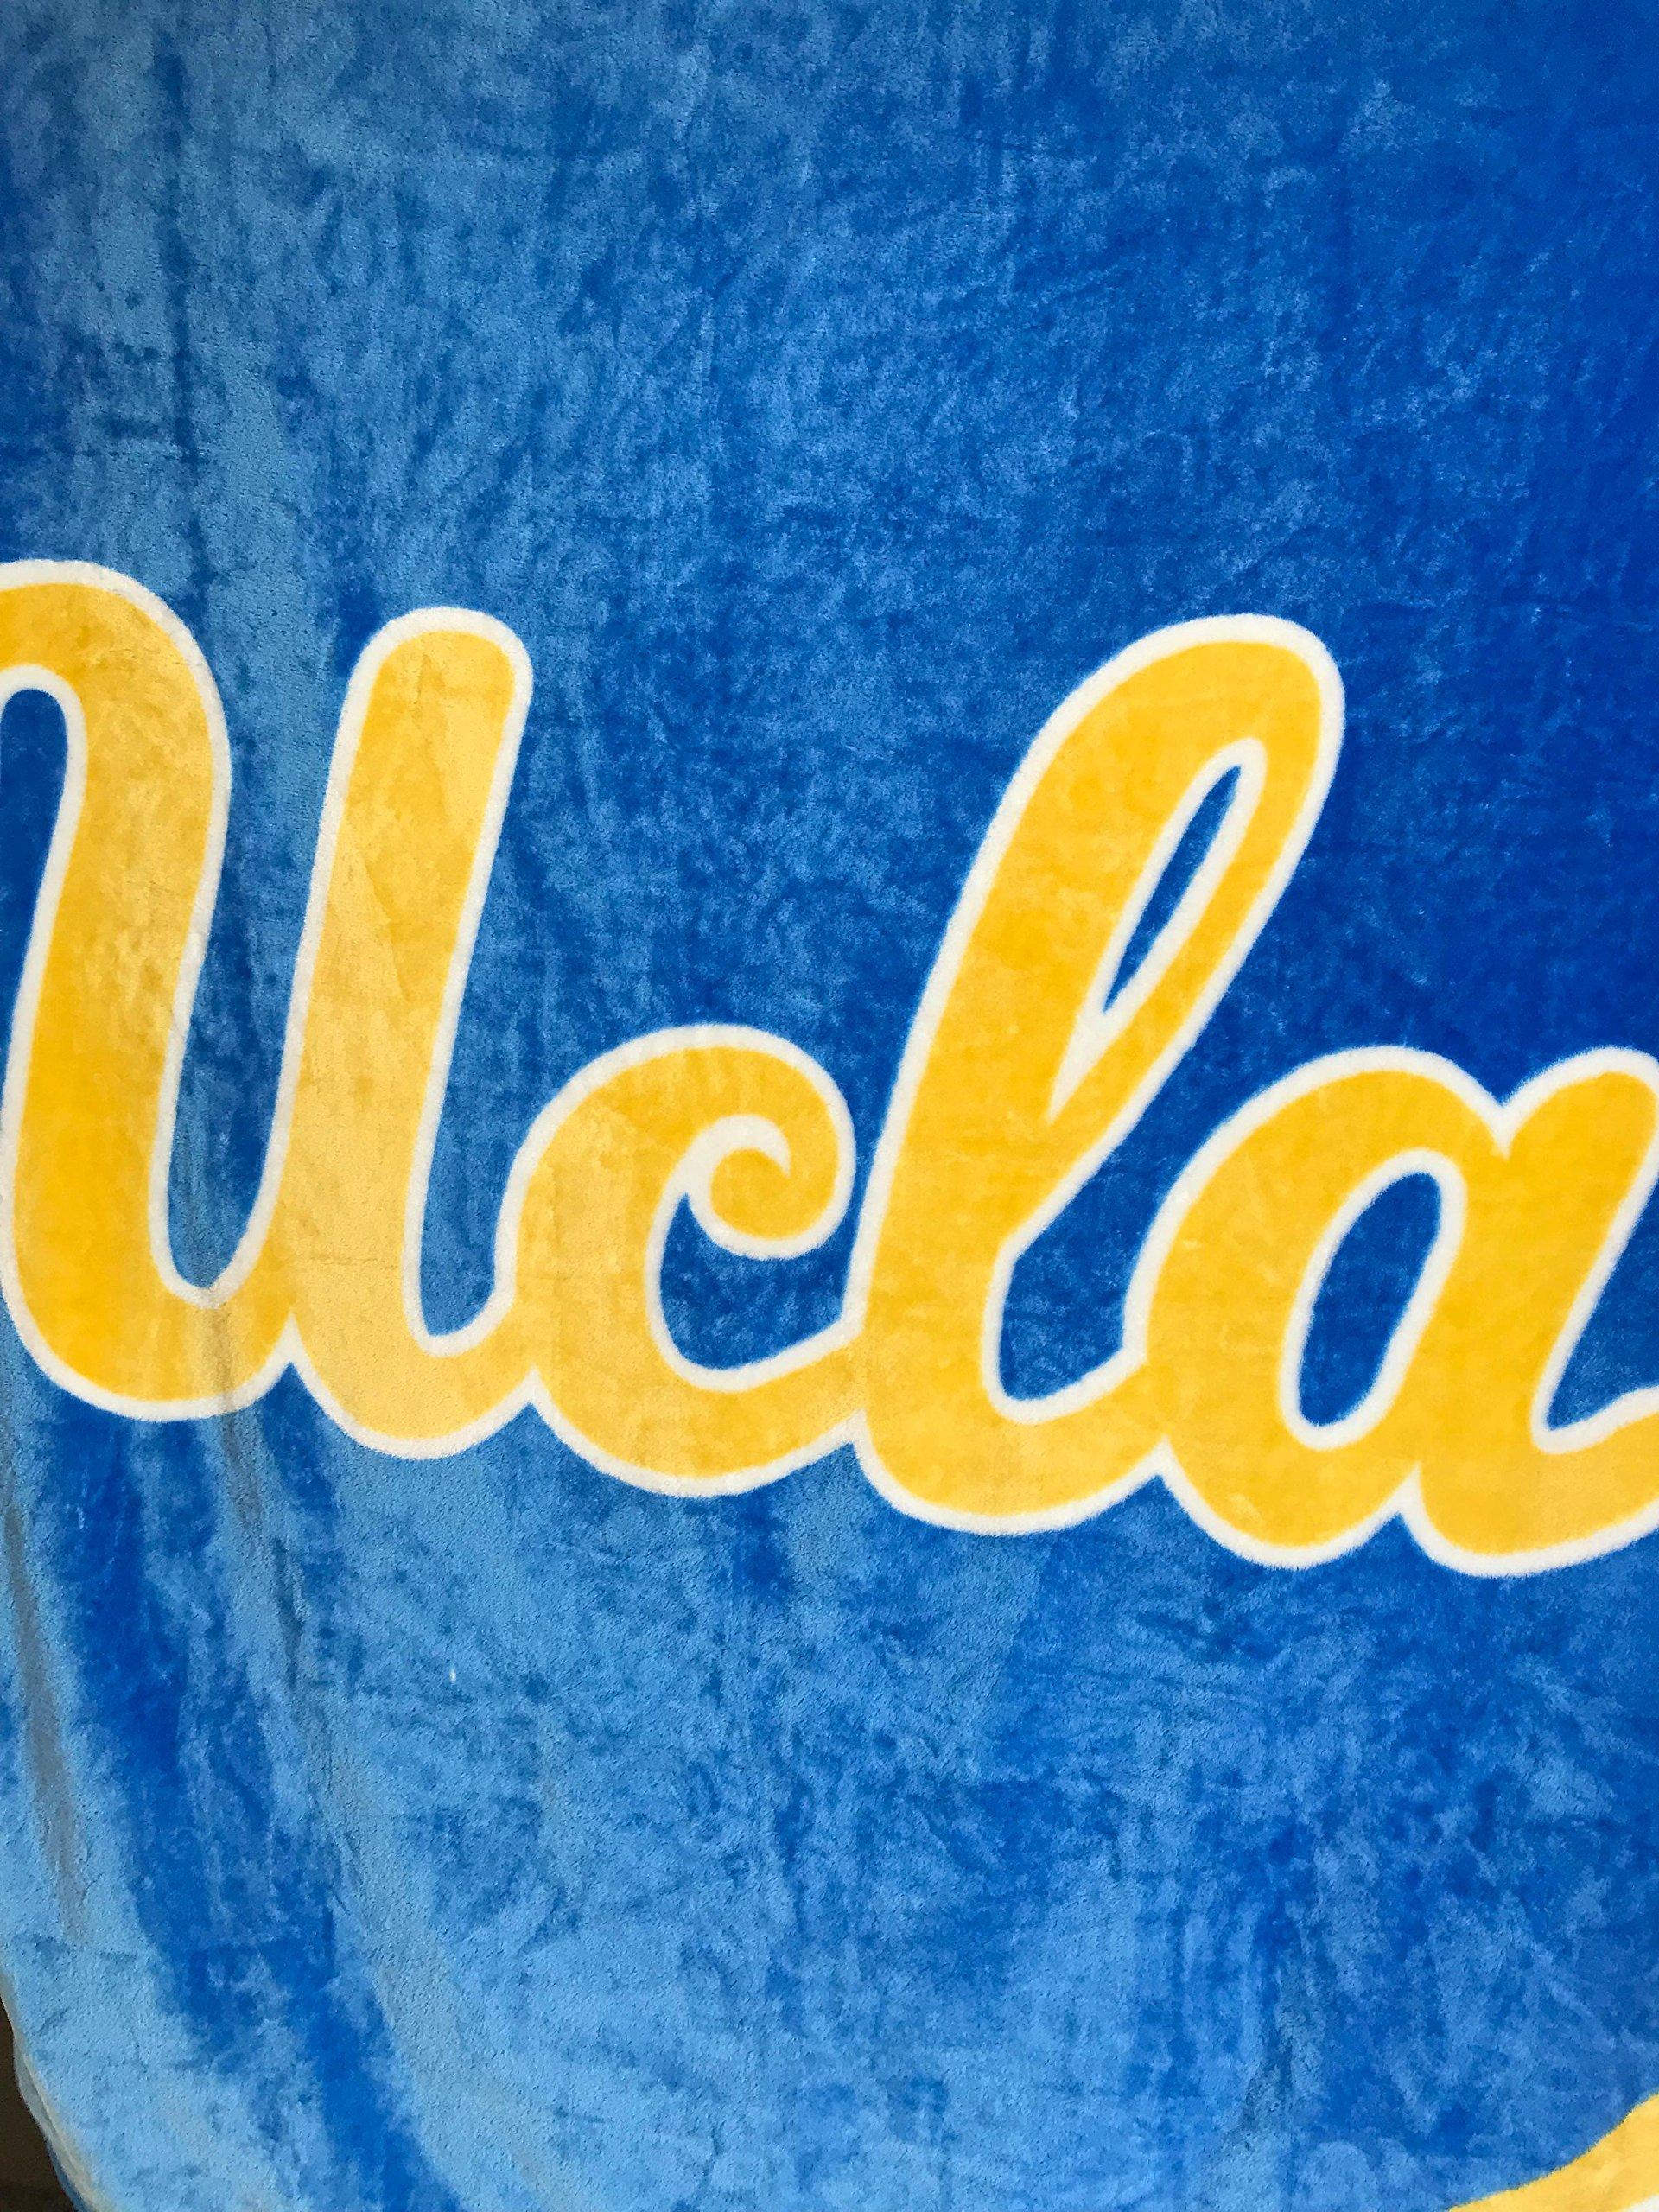 College Sport Oversized Deluxe Plush Blanket 60''X80'' UCLA